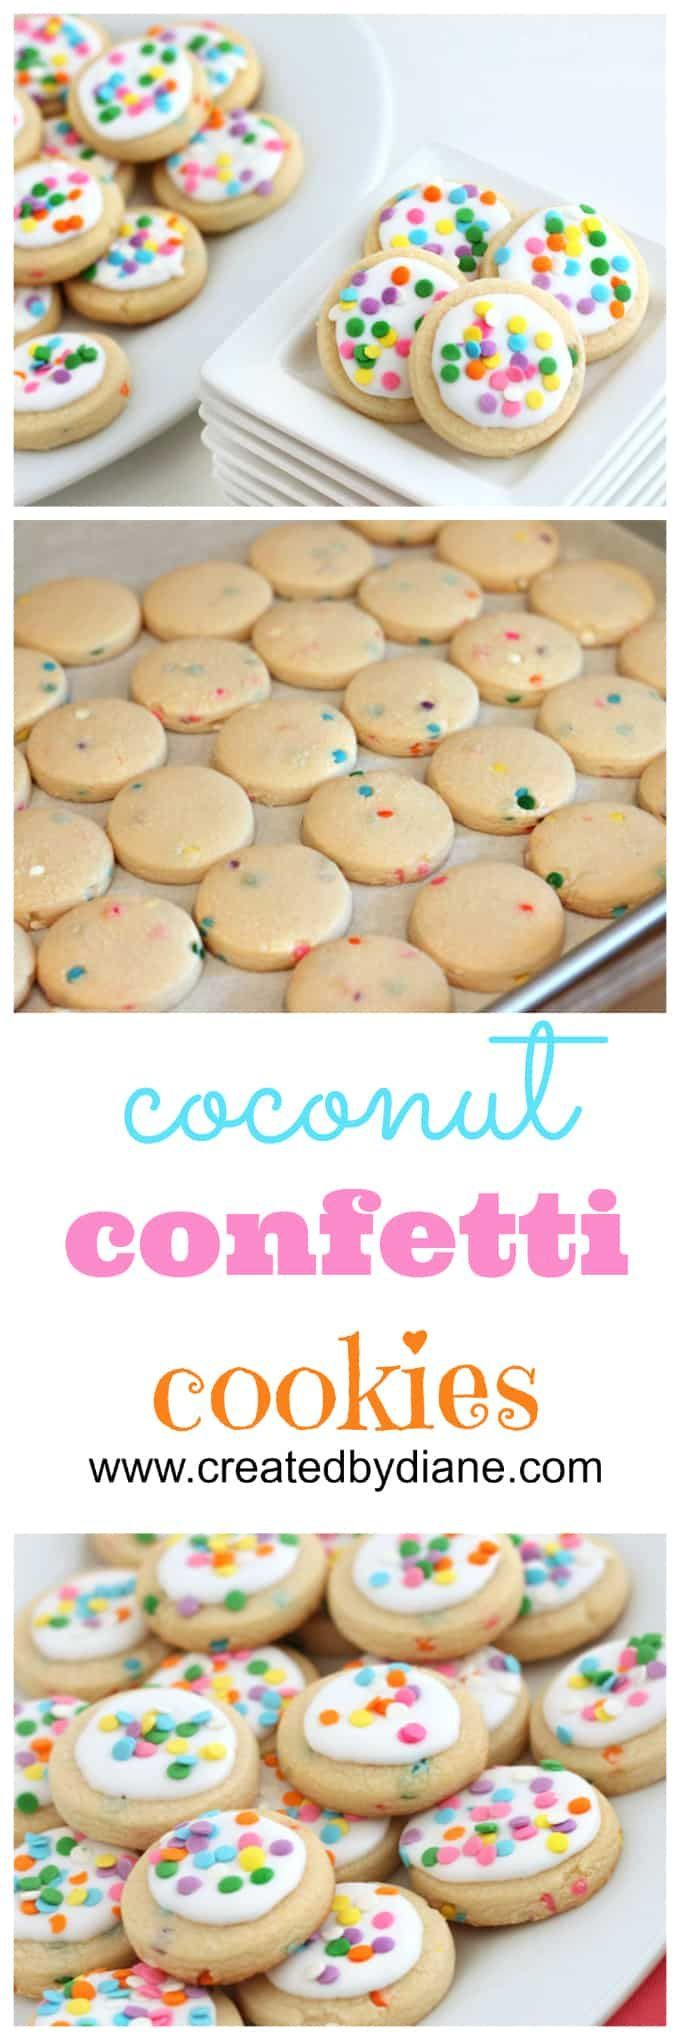 coconut confetti cookies from www.createdbydiane.com